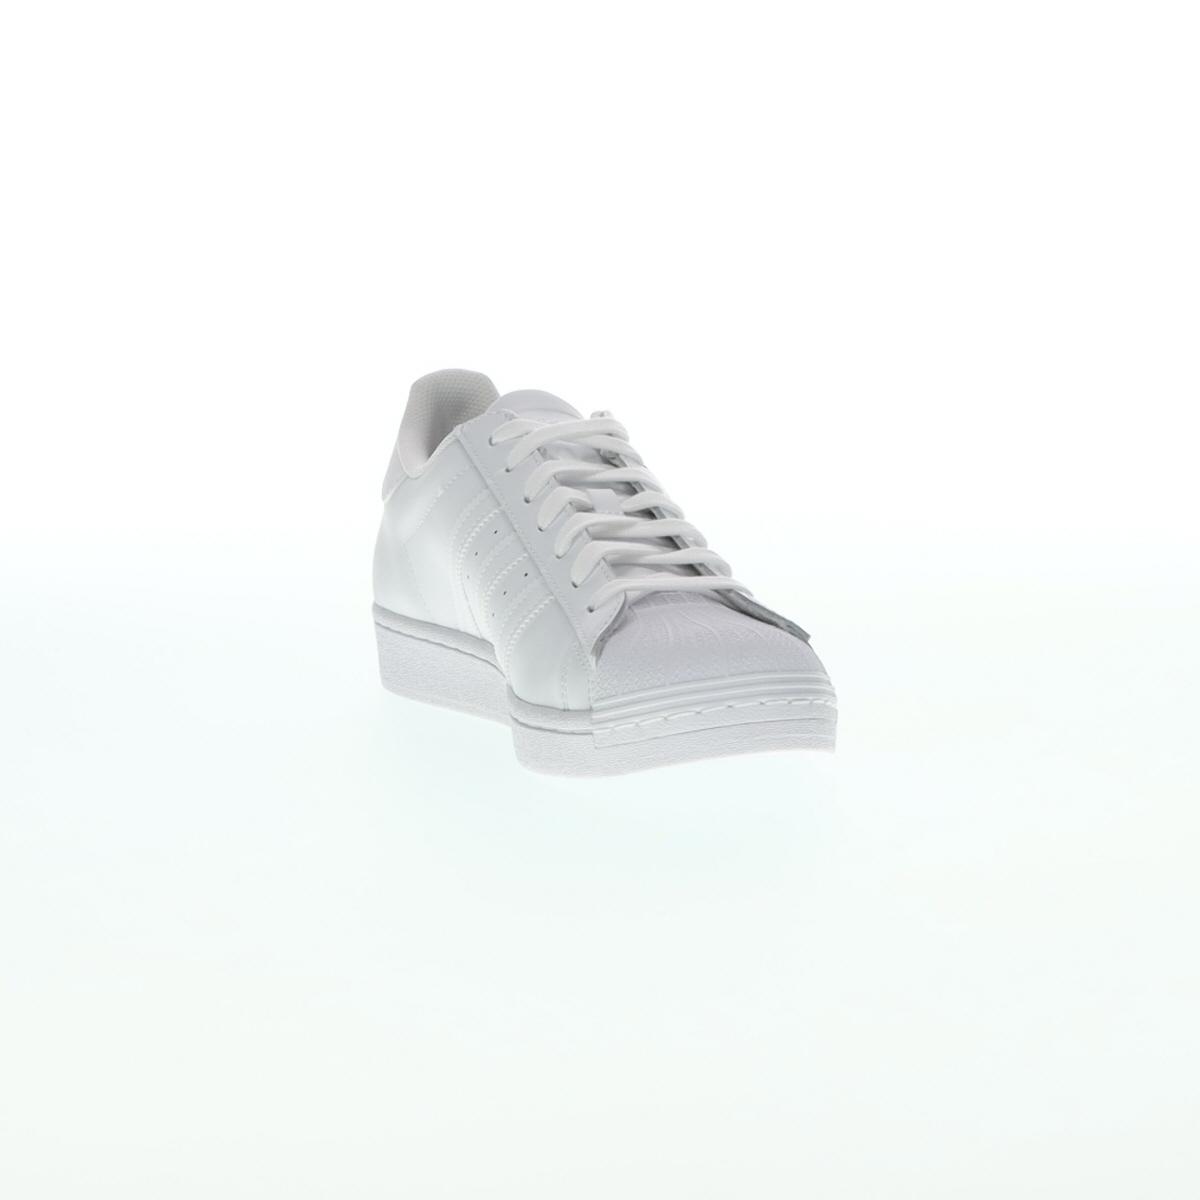 adidas nmd japanese chuka style boots